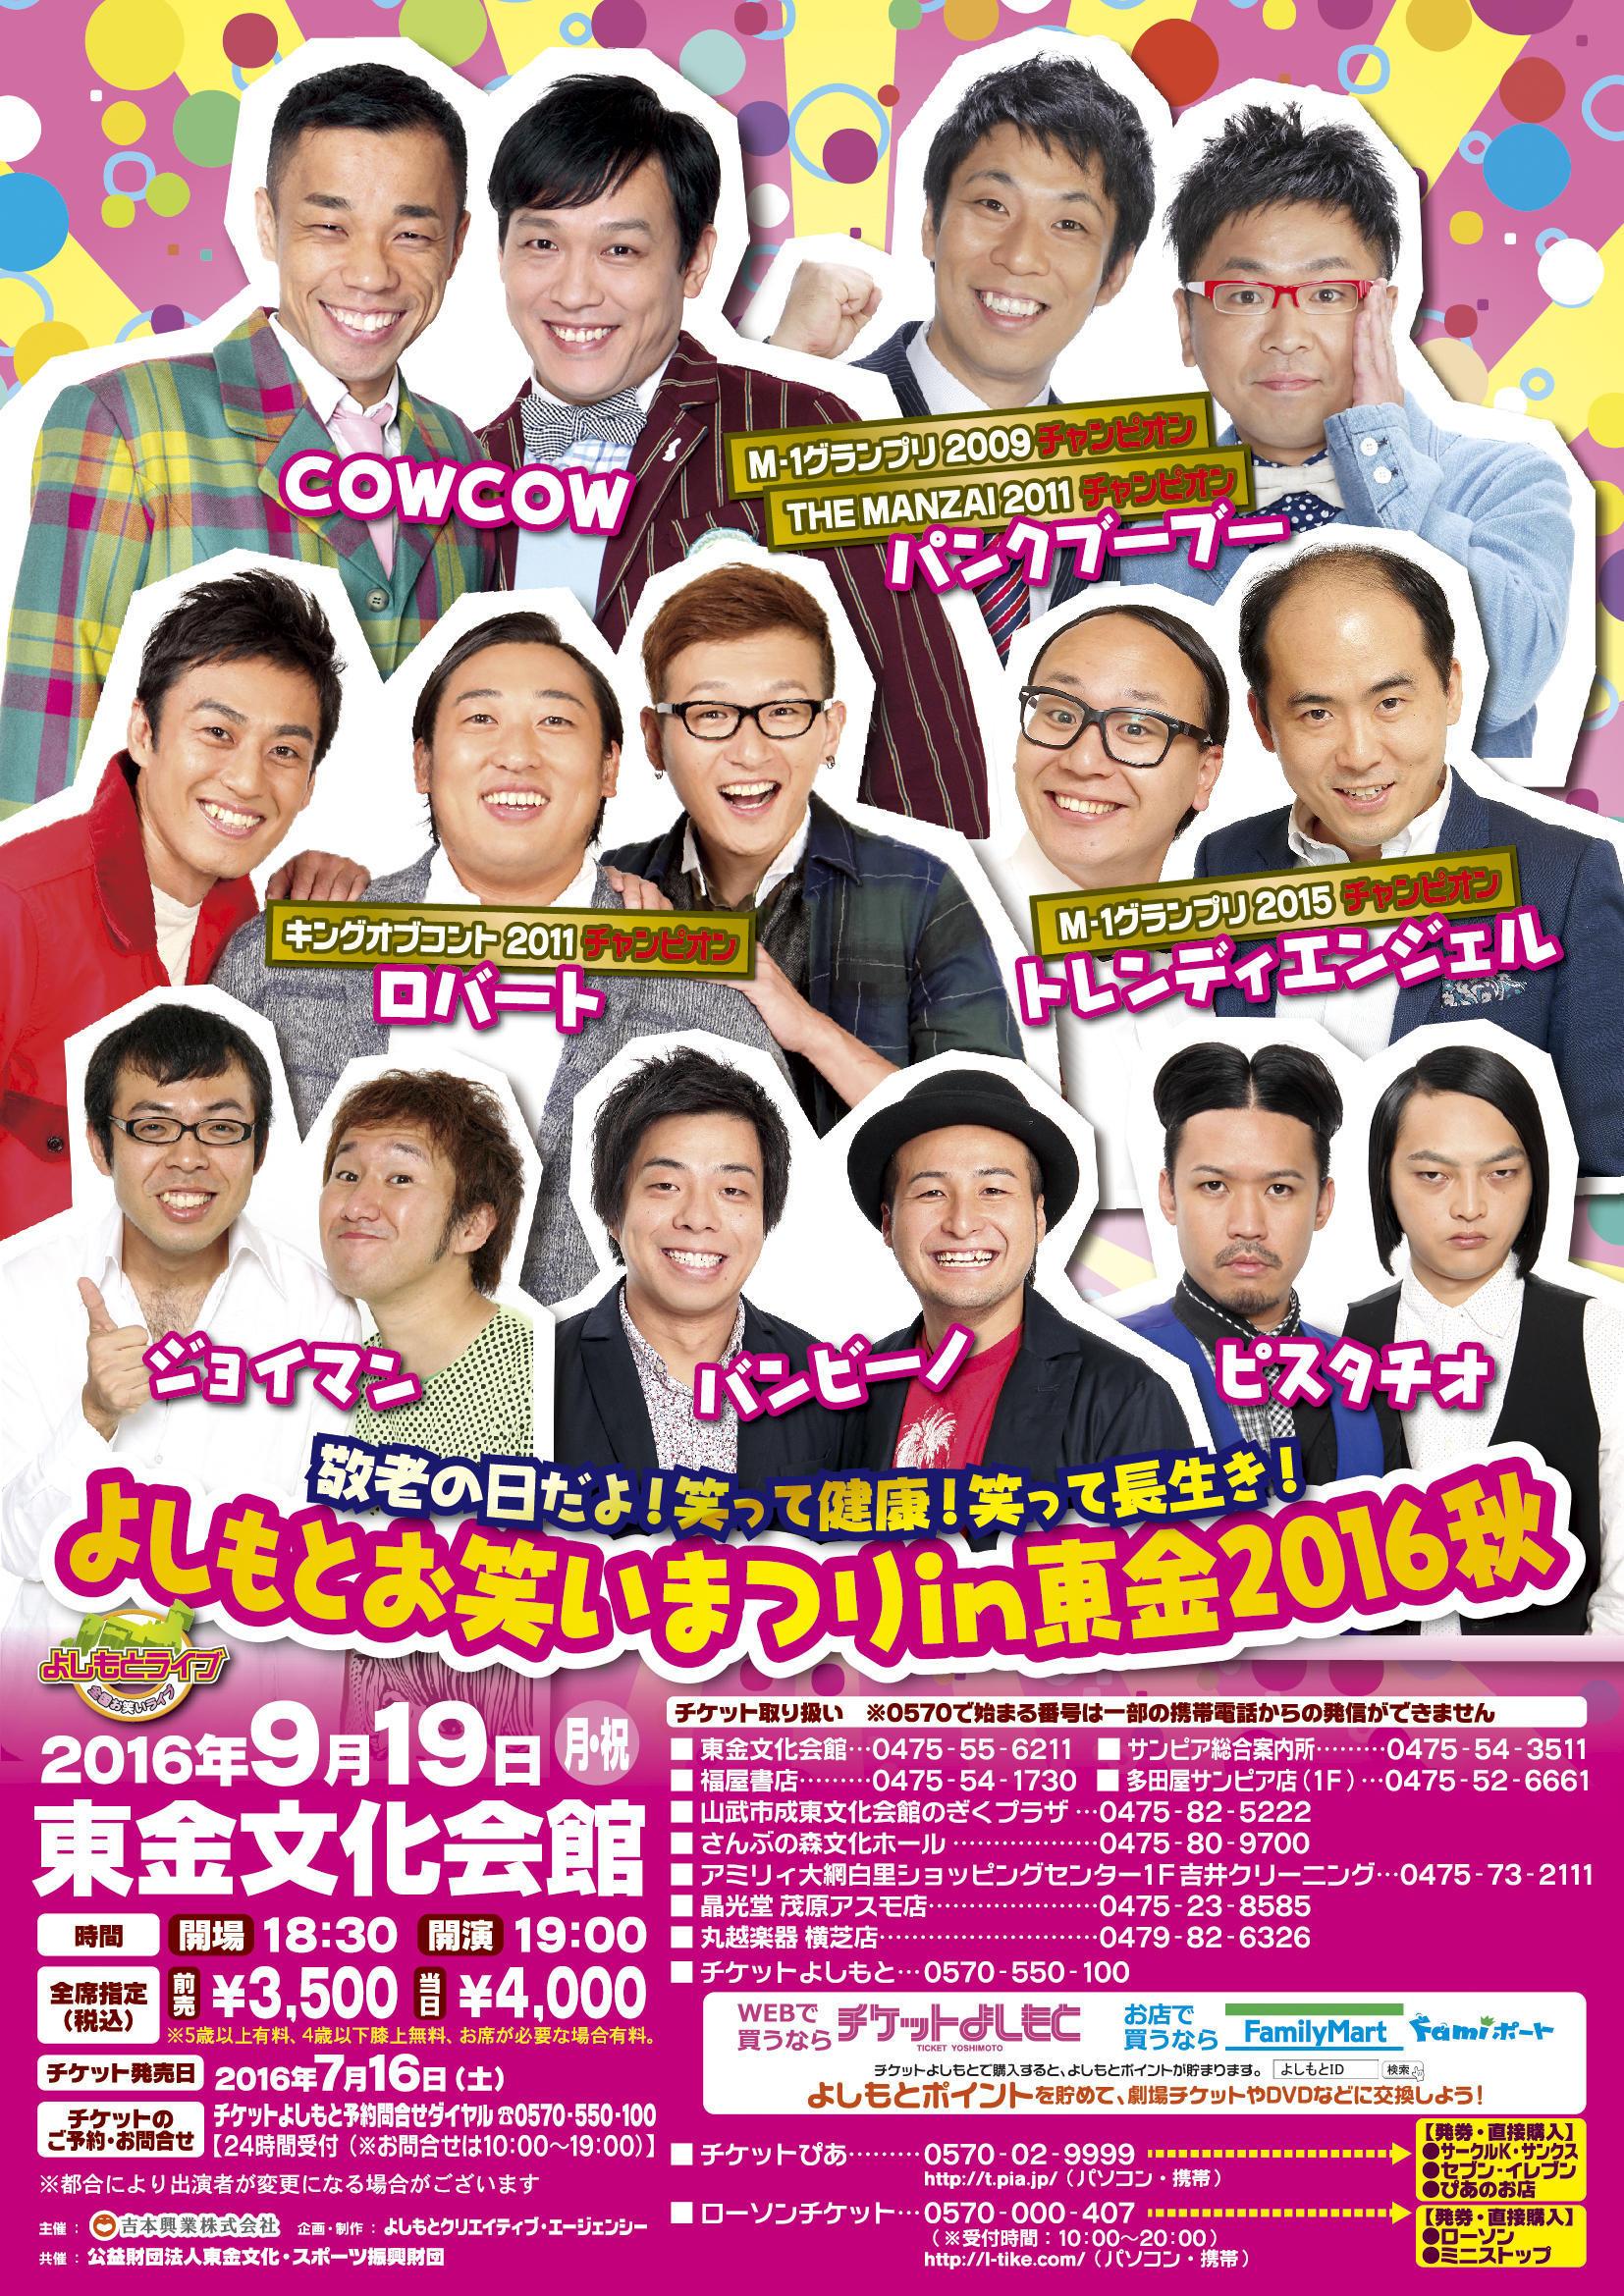 http://www.syumatsu.jp/20160622132135-51b2f59a865f882f9d9723bb001d9b2e6fdf5417.jpg